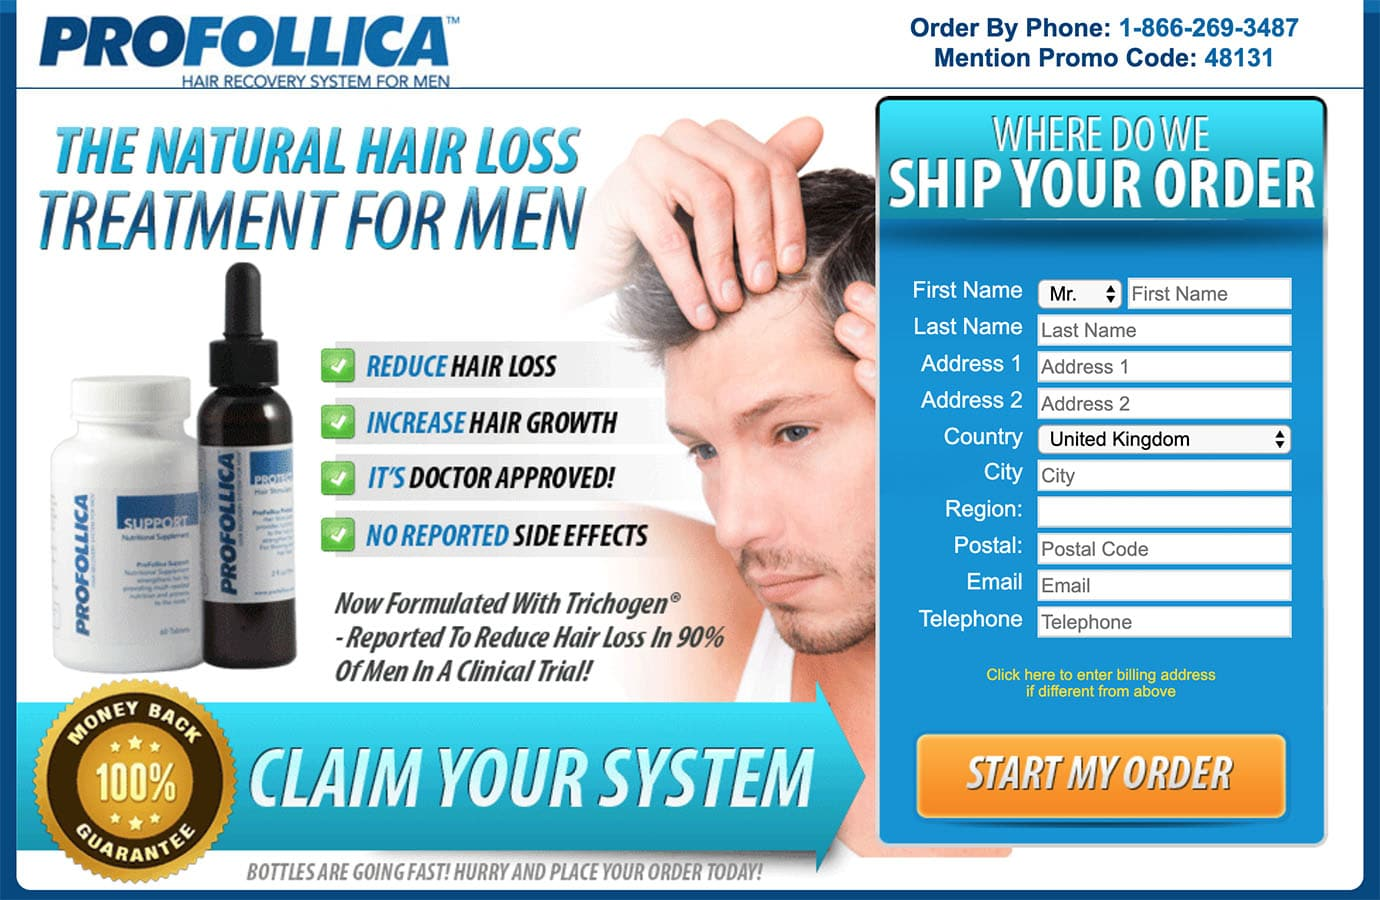 profollica uk website